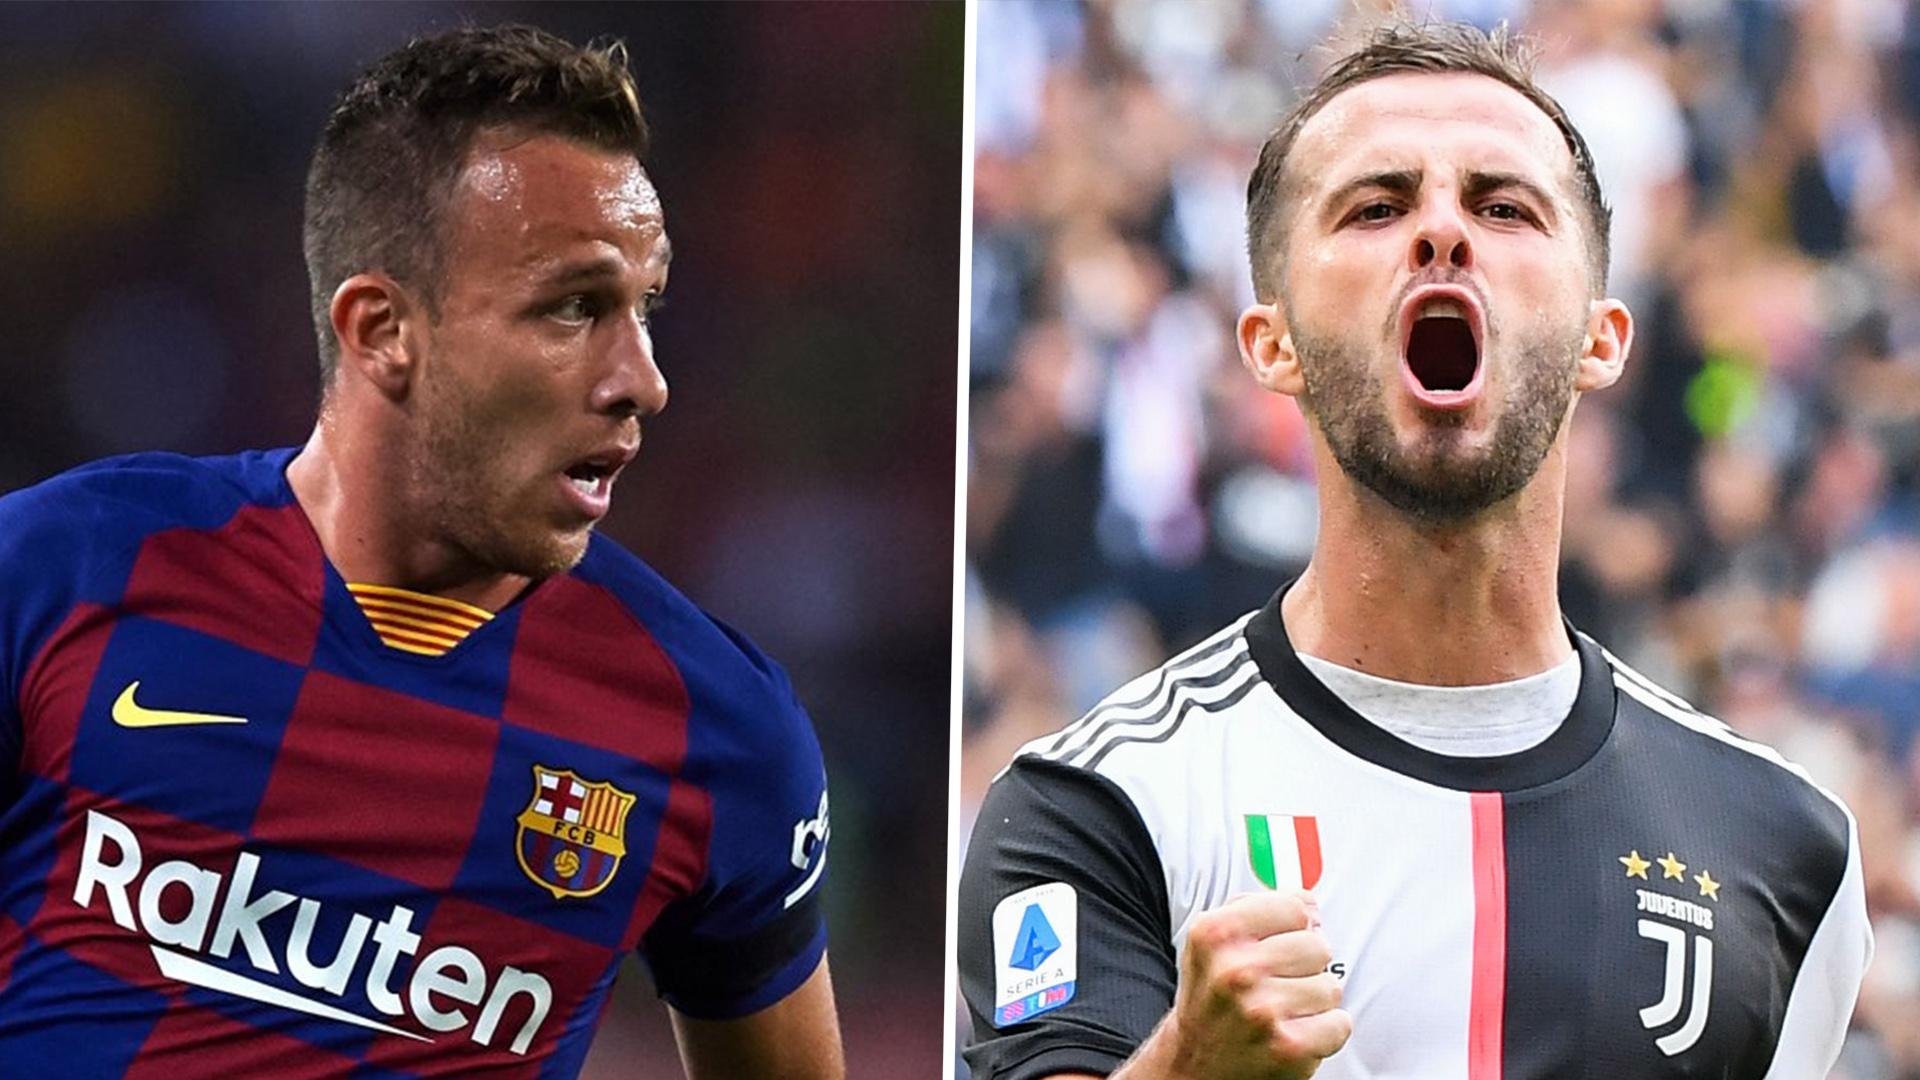 Јуве даде 80 милиони за Артур, Барса 70 за Пјаниќ, но двата клуба ќе запишат 50 милиони профит?